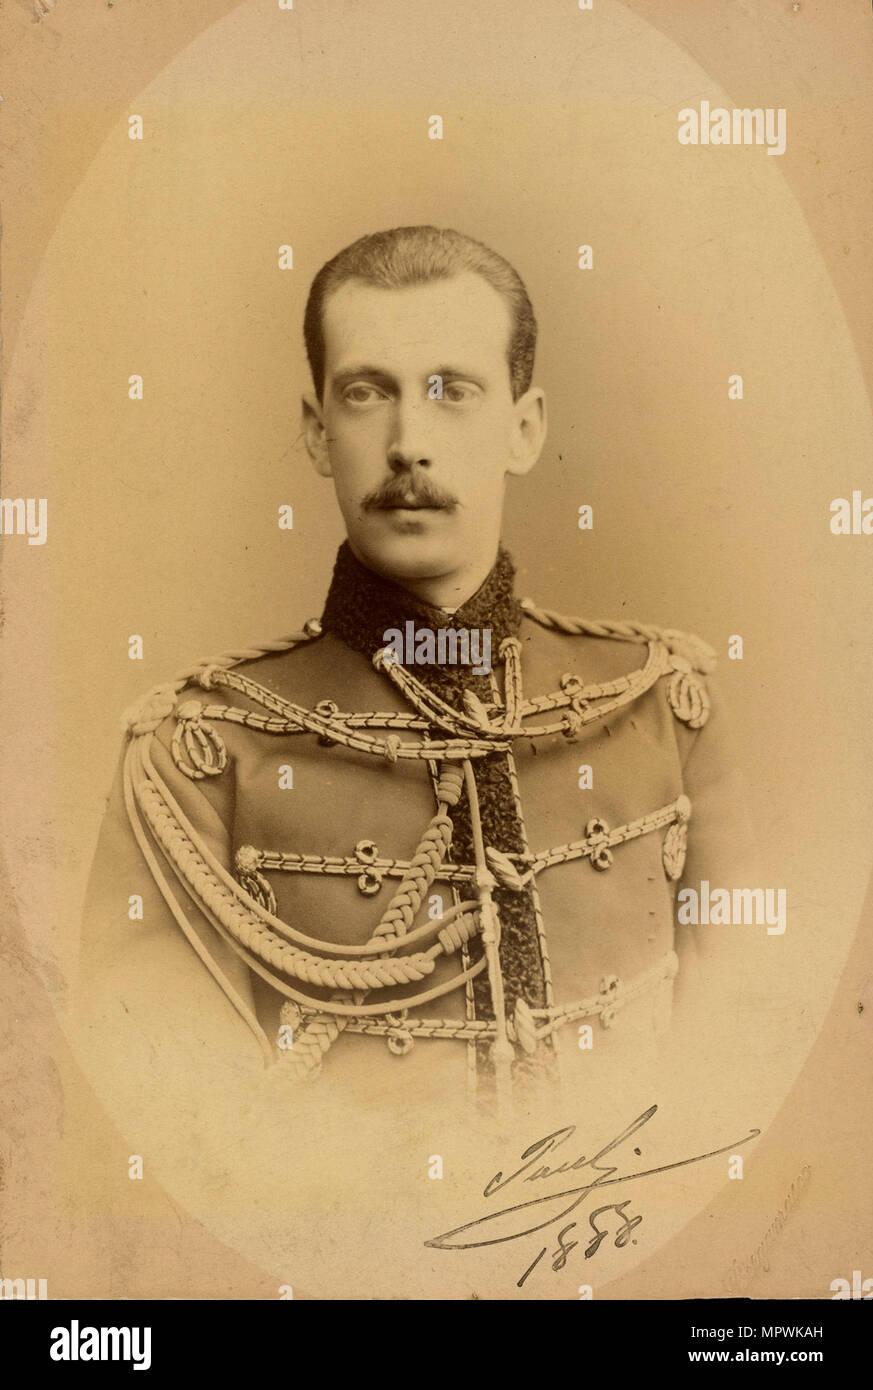 Portrait of Grand Duke Paul Alexandrovich of Russia (1860-1919), 1888. - Stock Image